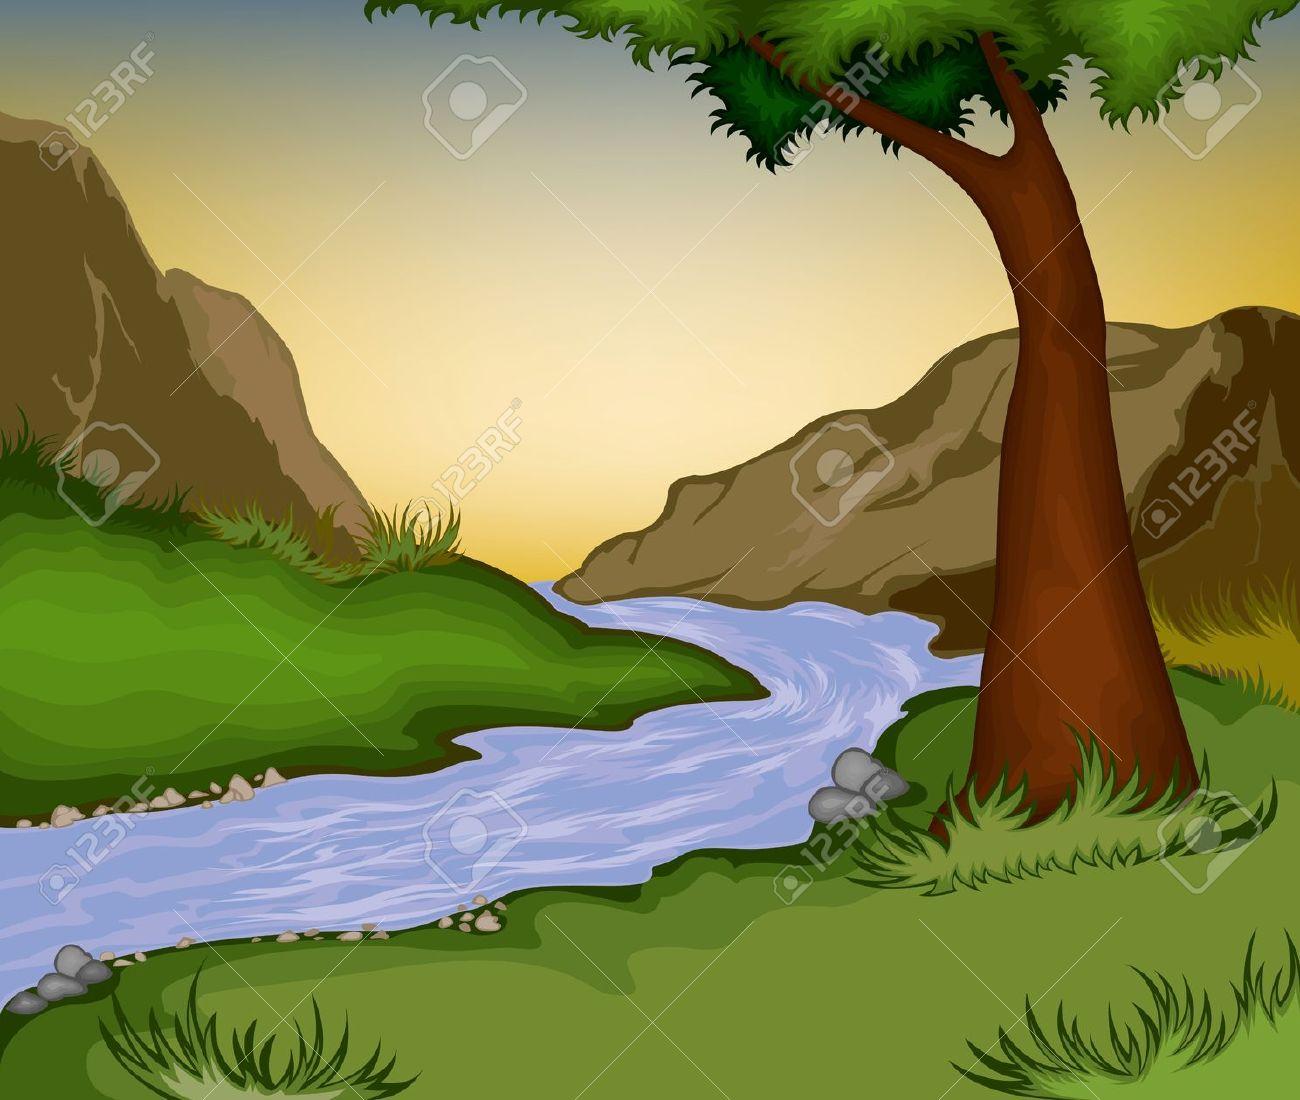 River background clipart picture transparent download Animated river clipart - ClipartFest picture transparent download